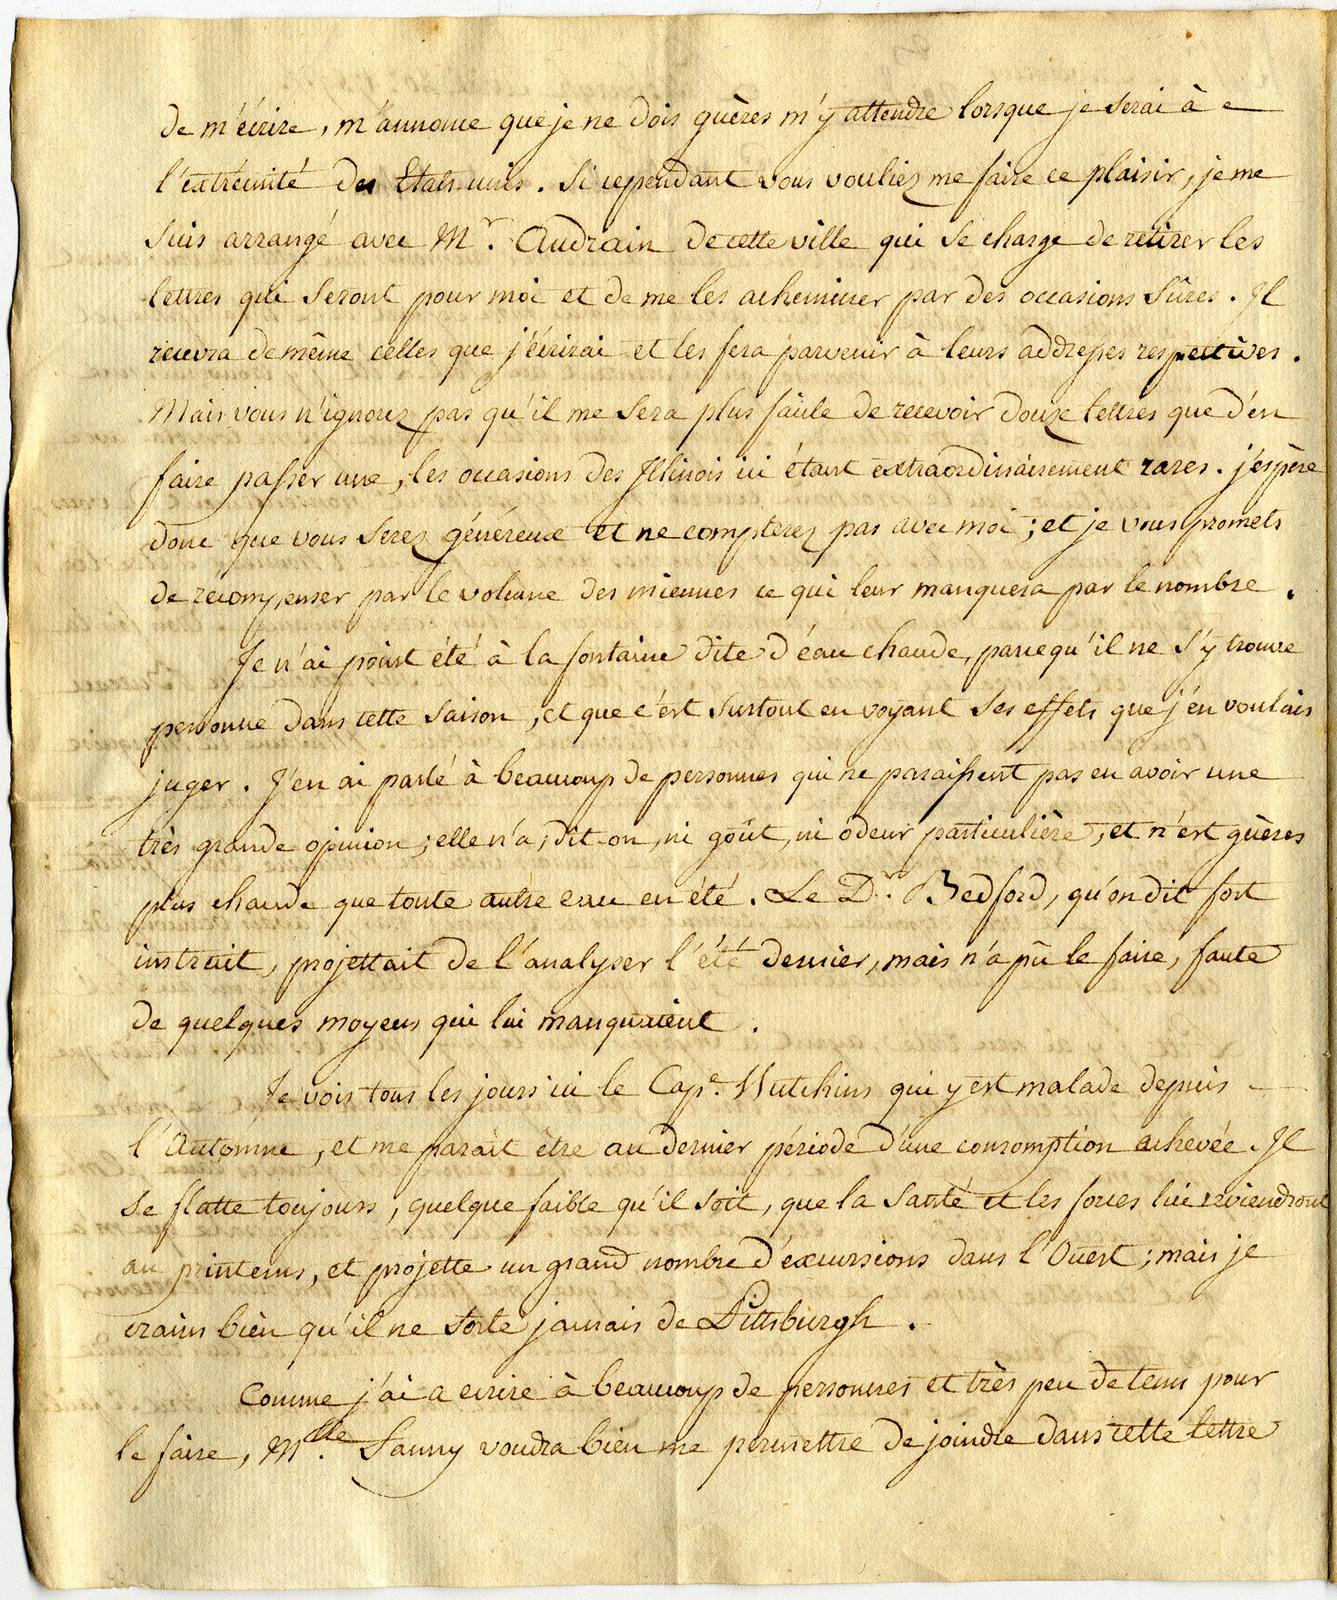 Letter from Barthelemi Tardiveau to St. John de Crevecoeur